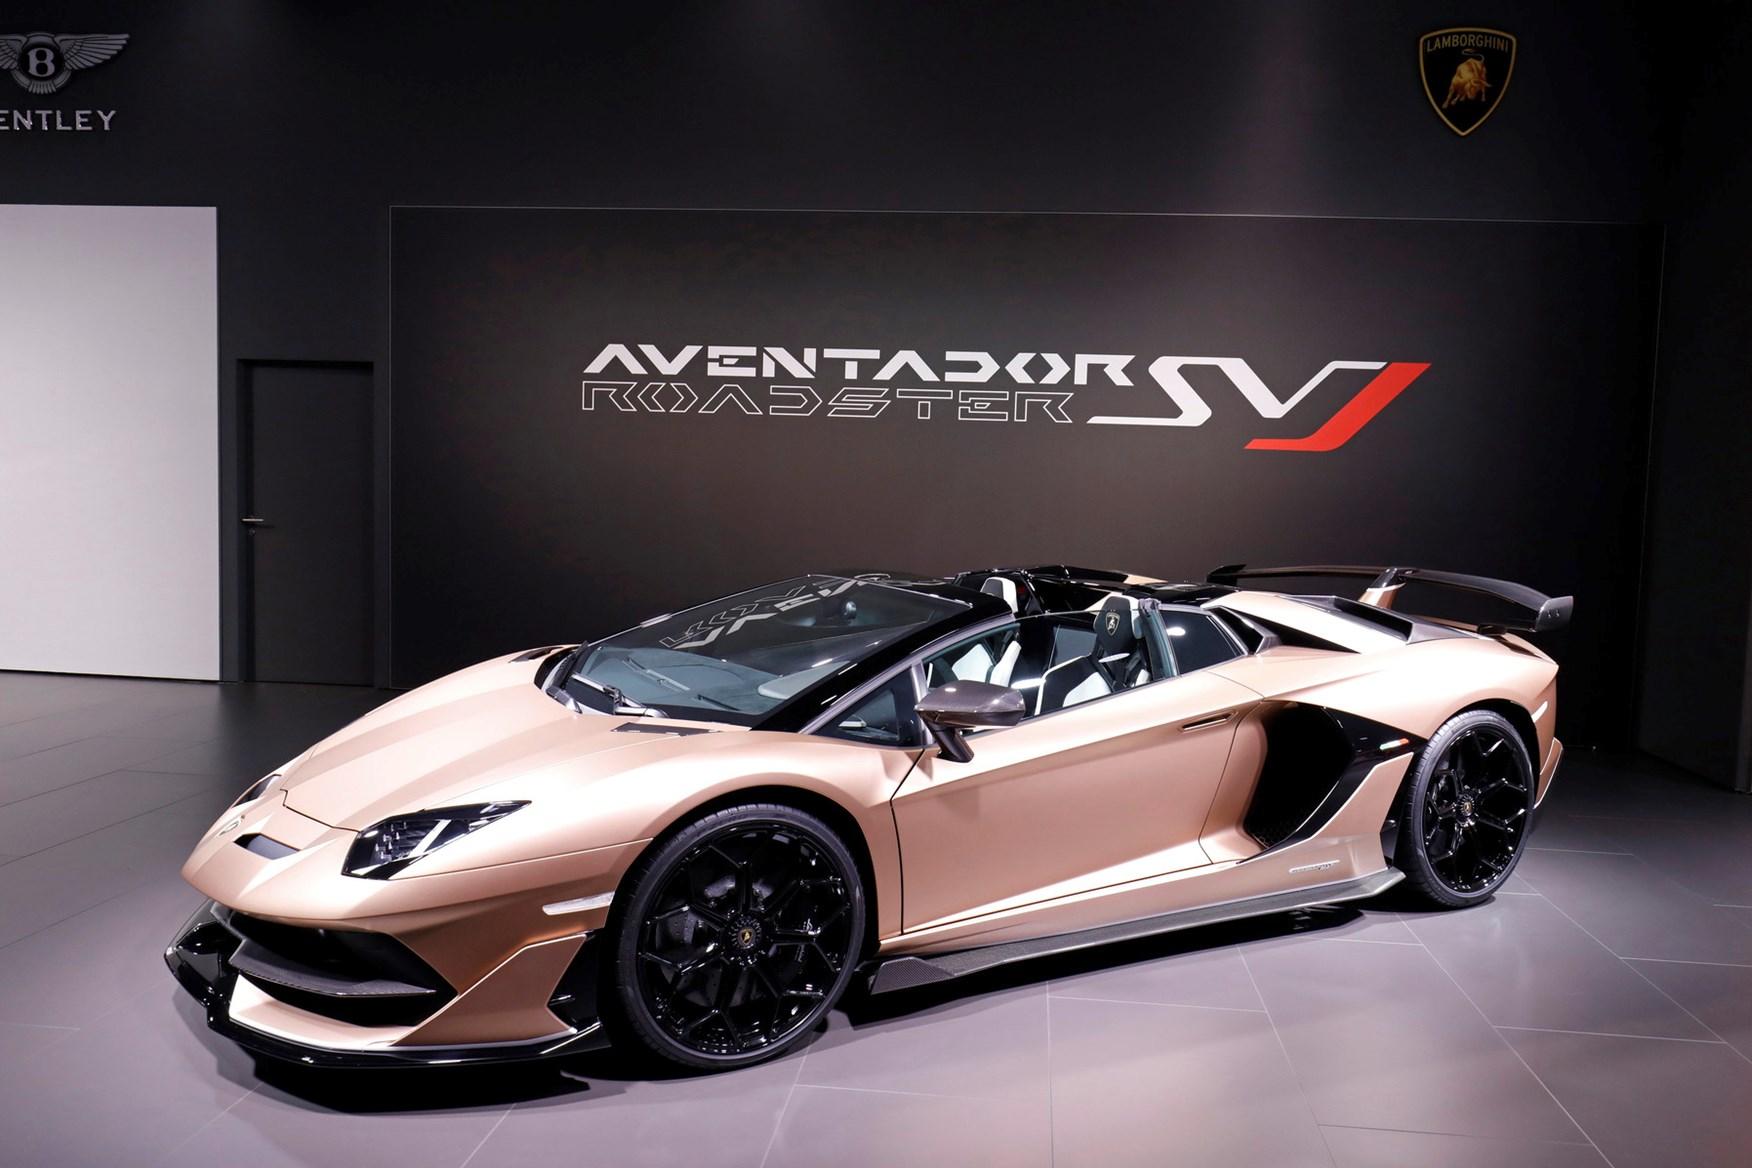 Outrageous 217mph Lamborghini Aventador Svj Roadster Chops Its Top Car Magazine